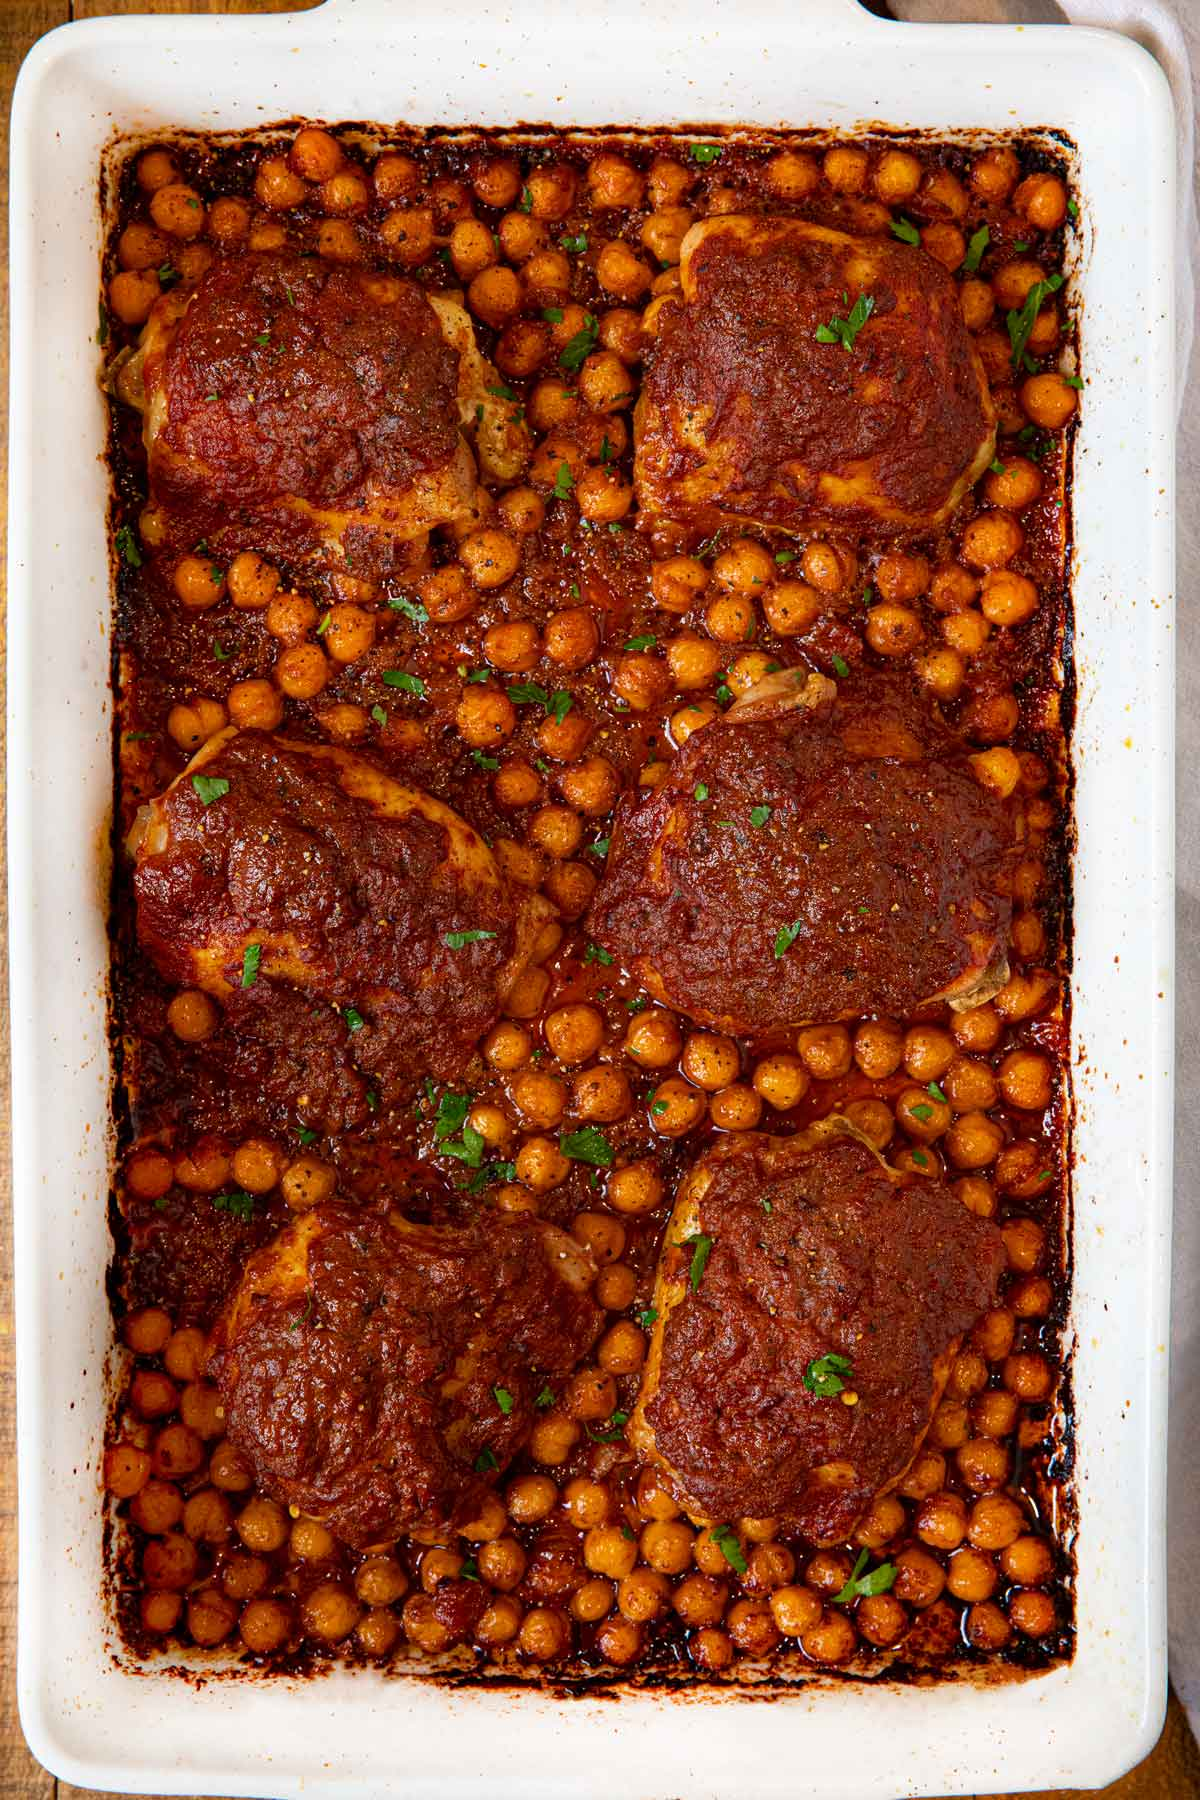 Chicken Tikka Masala Bake in baking dish